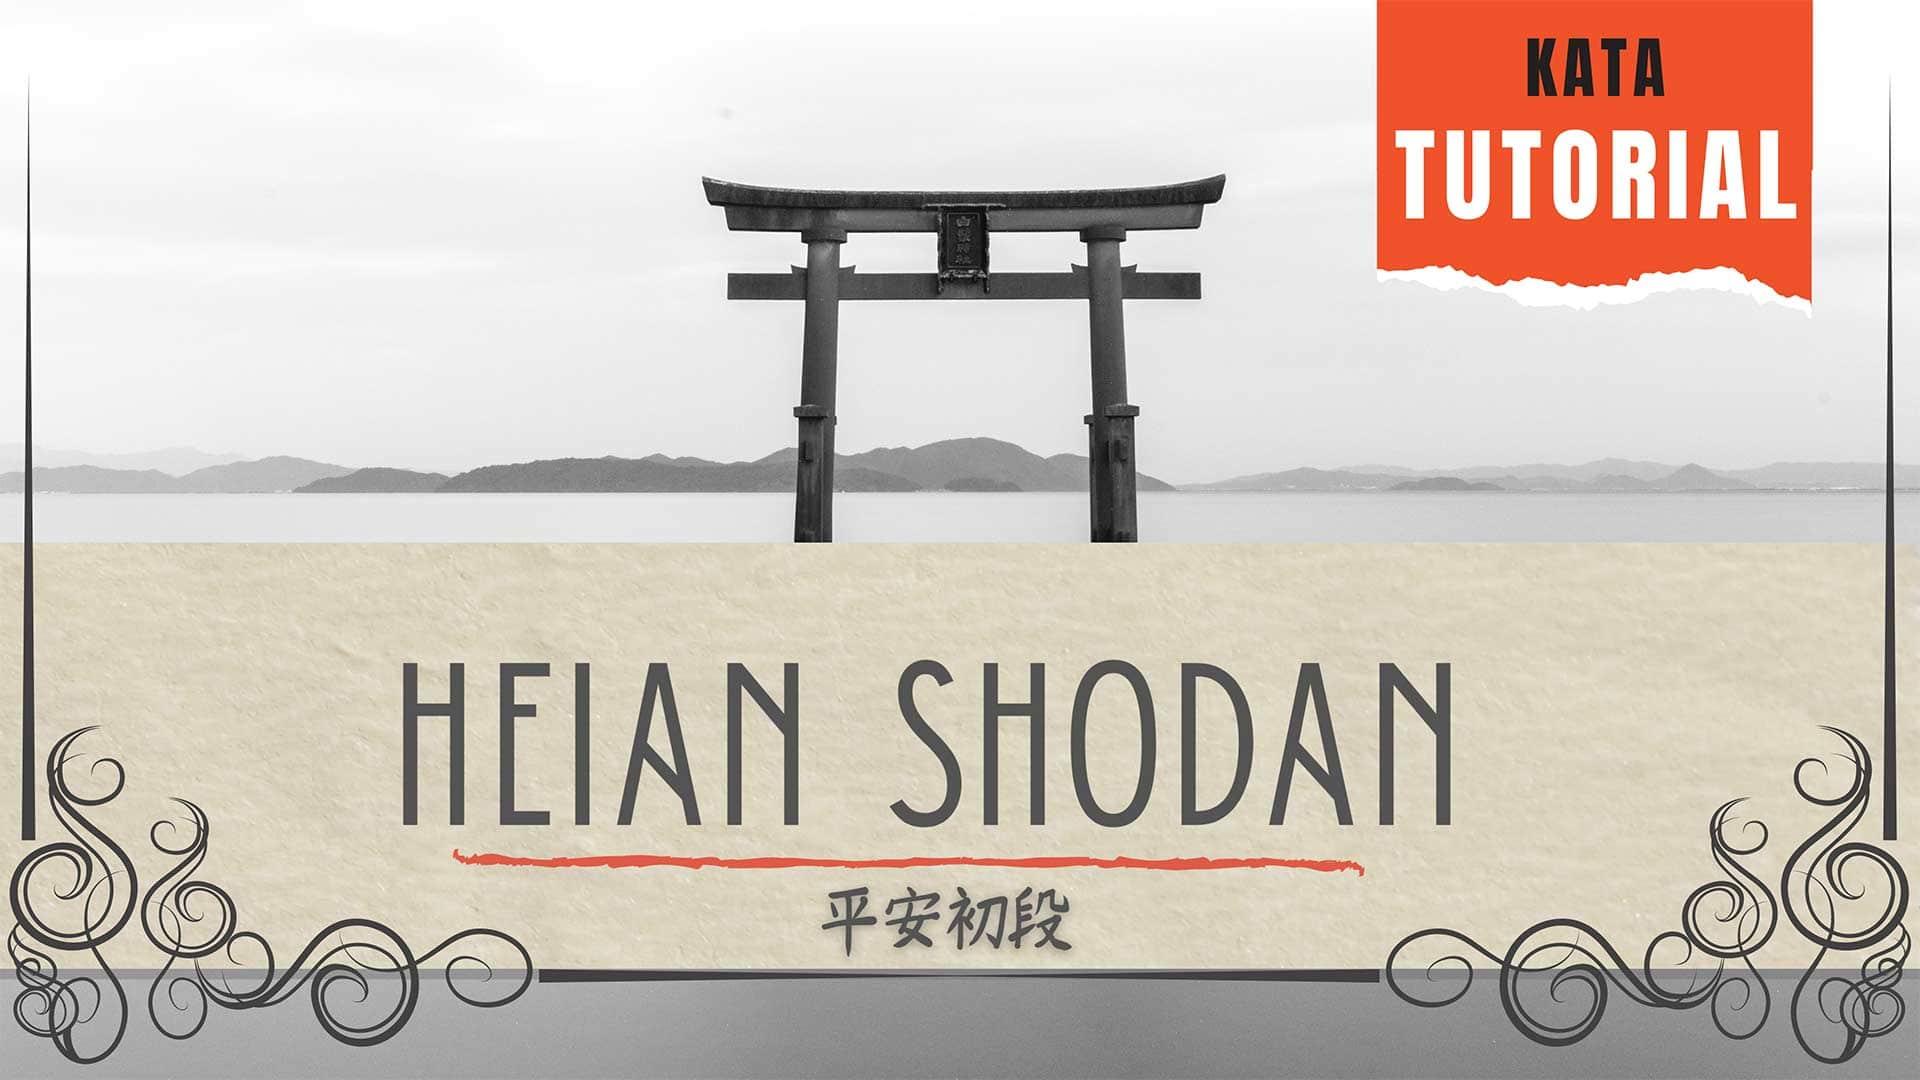 heian shodan kata tutorial